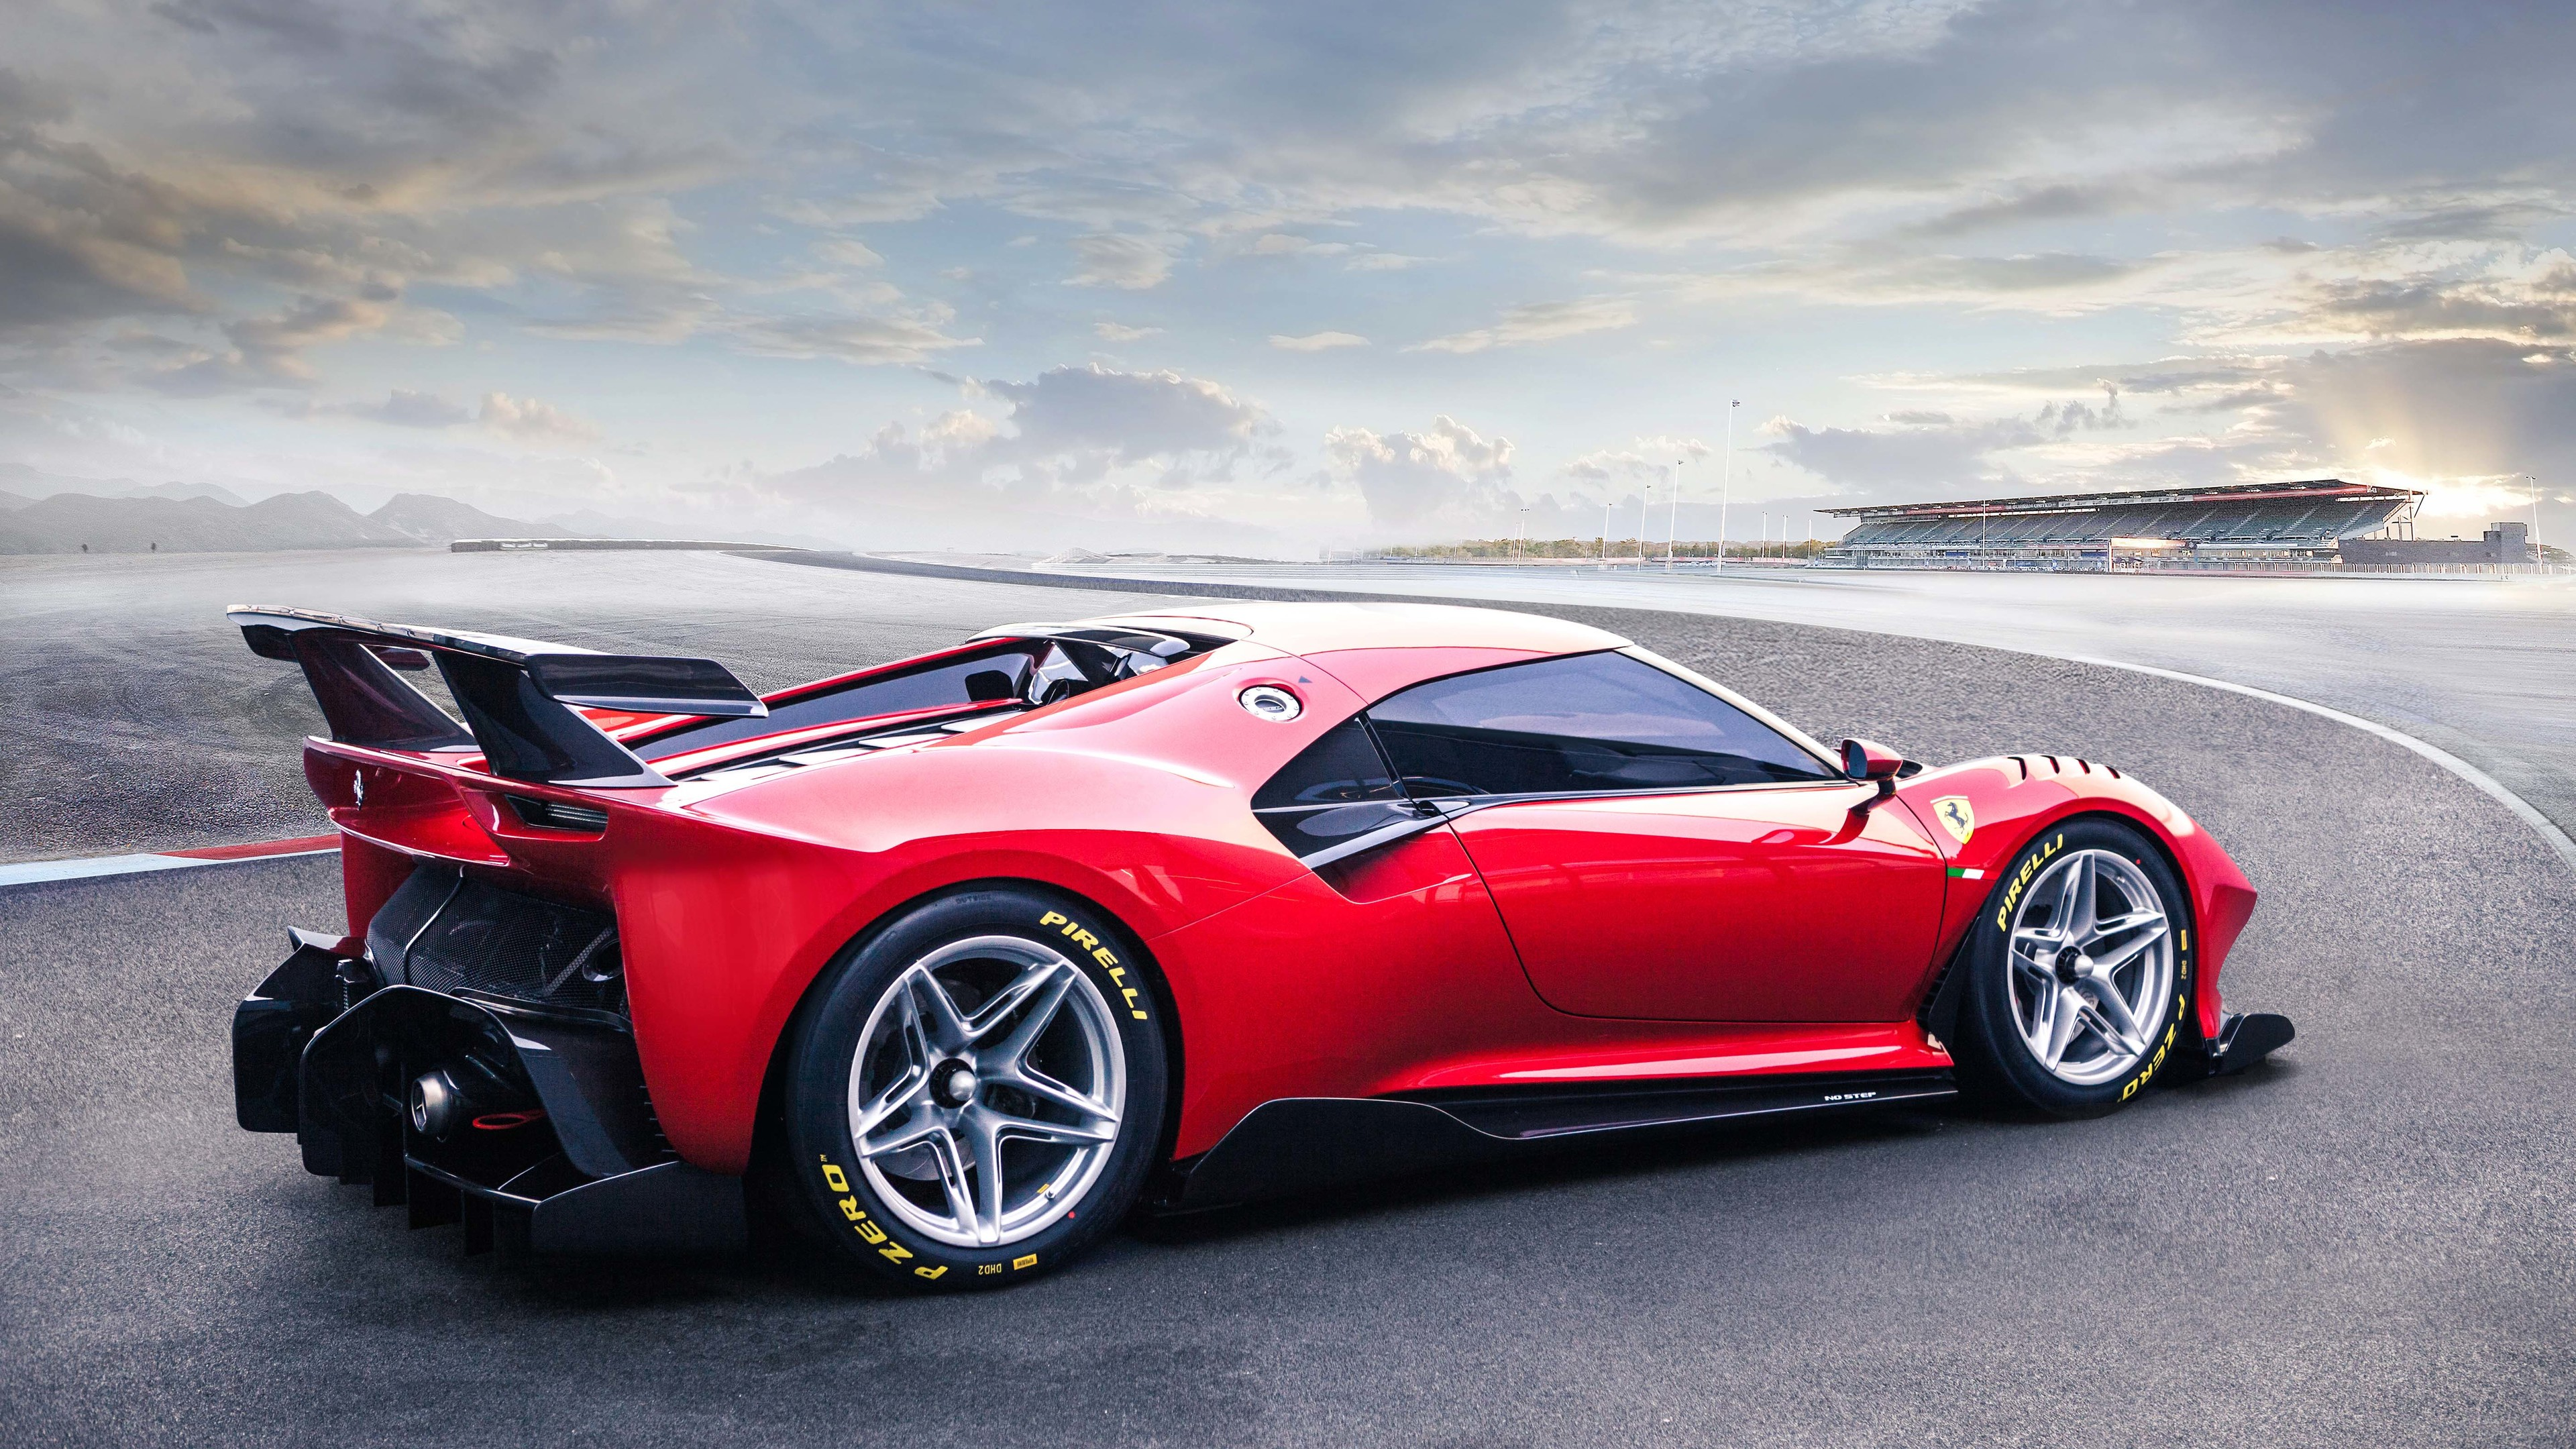 Wallpaper 4k 2019 Ferrari P80 C 4k 2019 Cars Wallpapers 4k